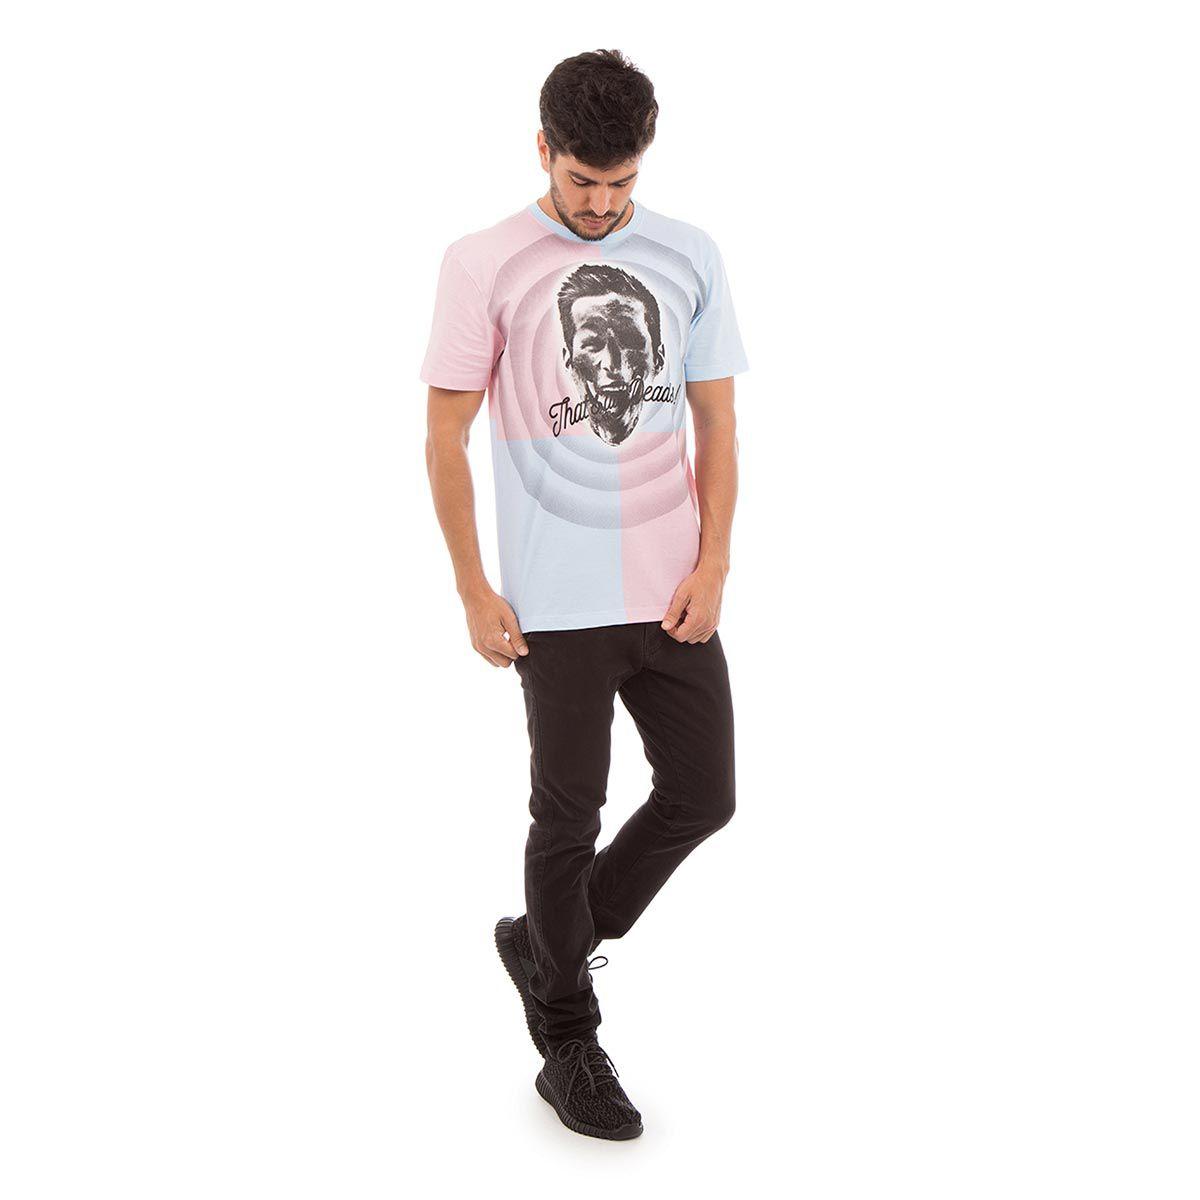 Camiseta AES 1975 Frenzy